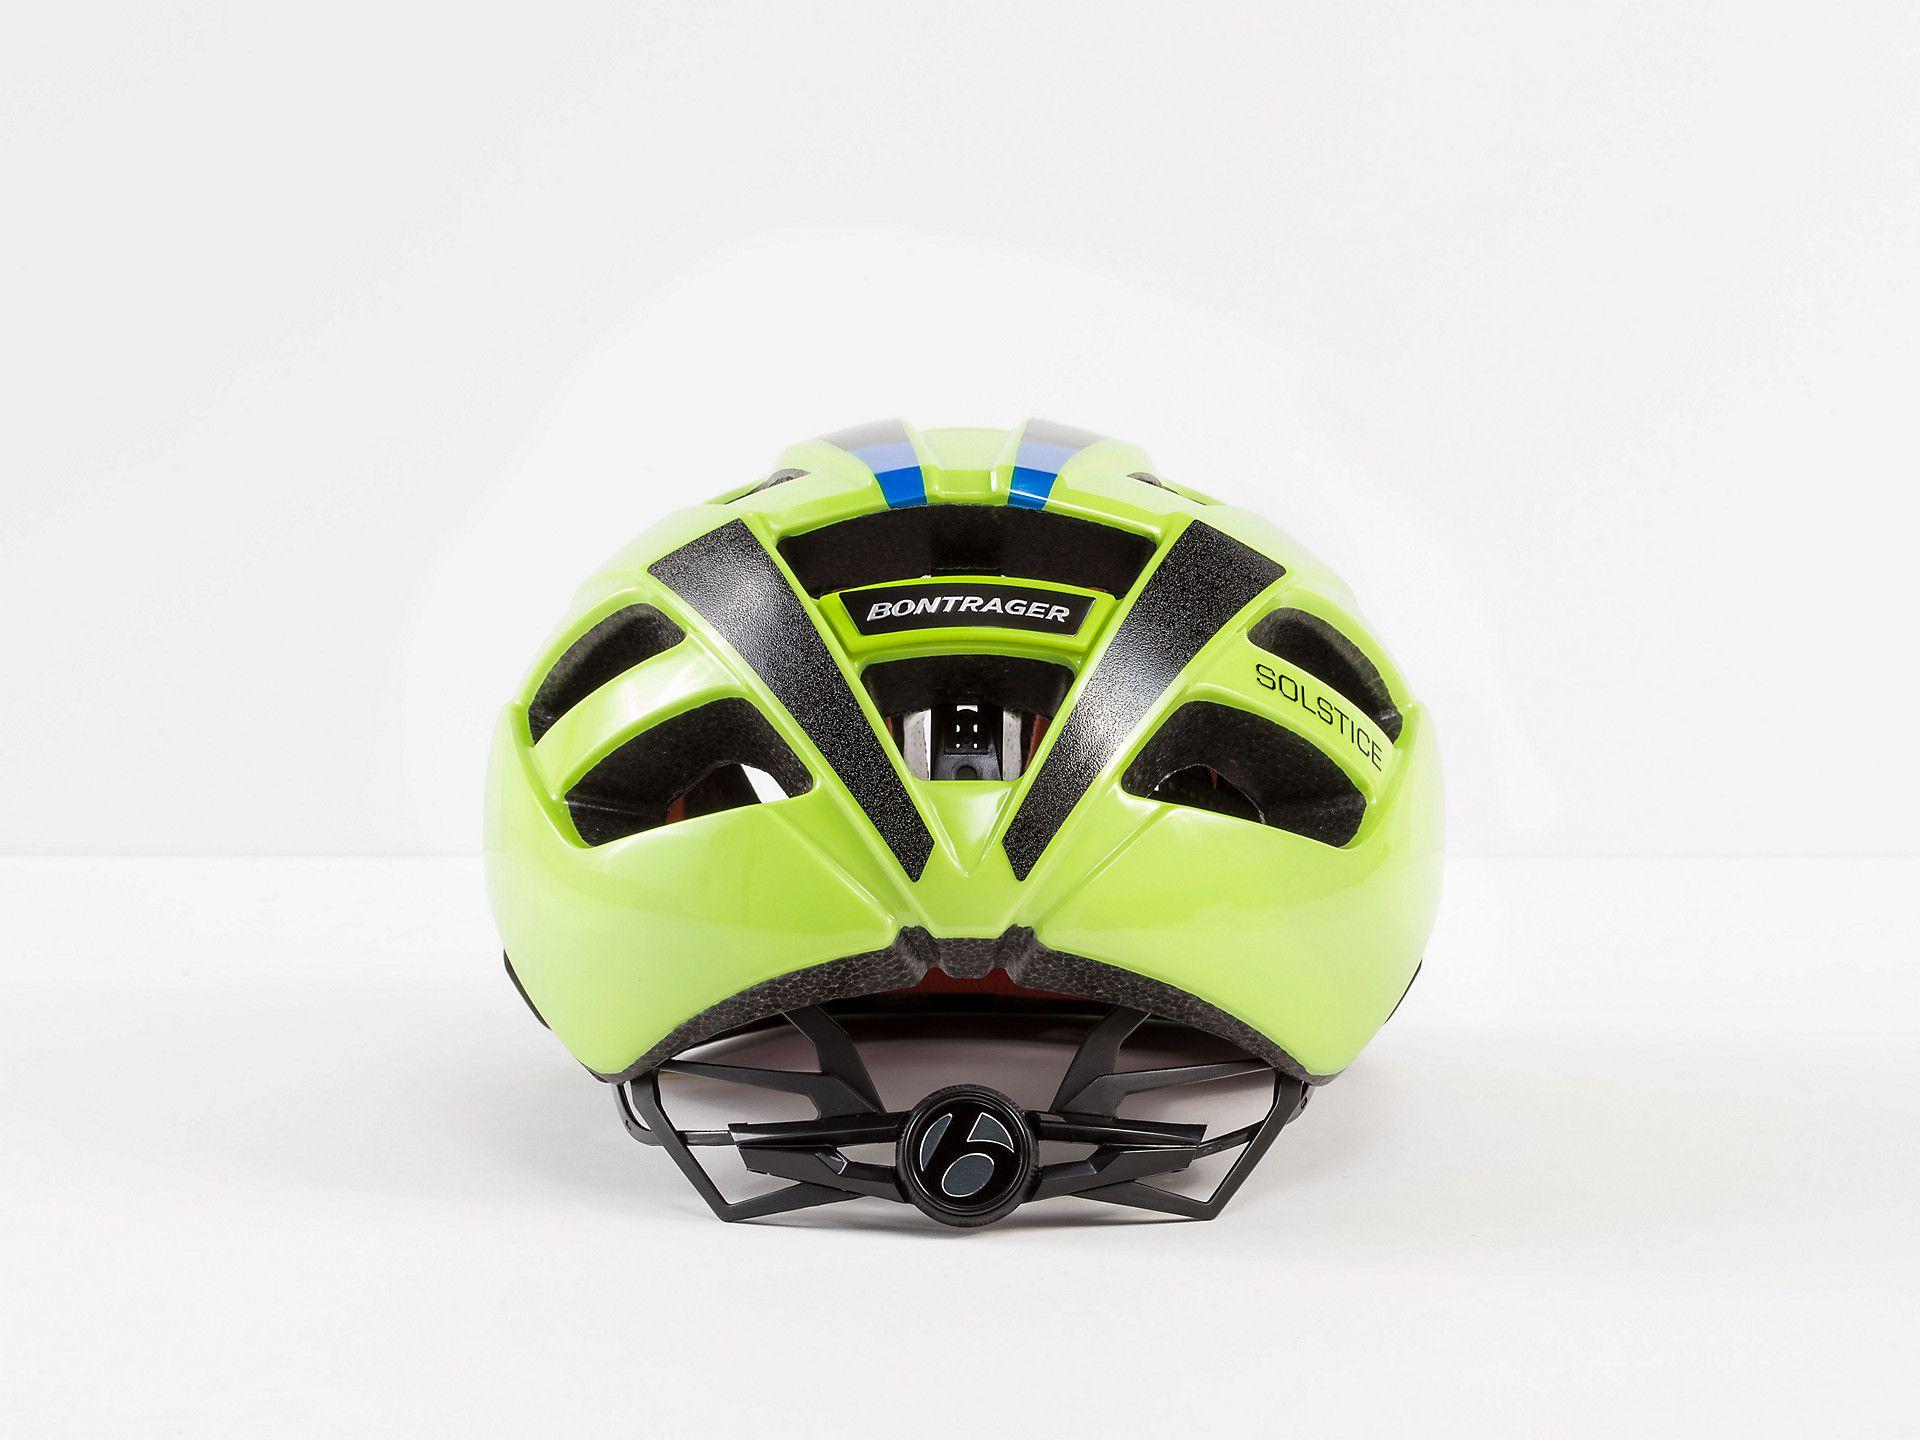 Capacete Infantil Ciclismo Solstice Bontrager